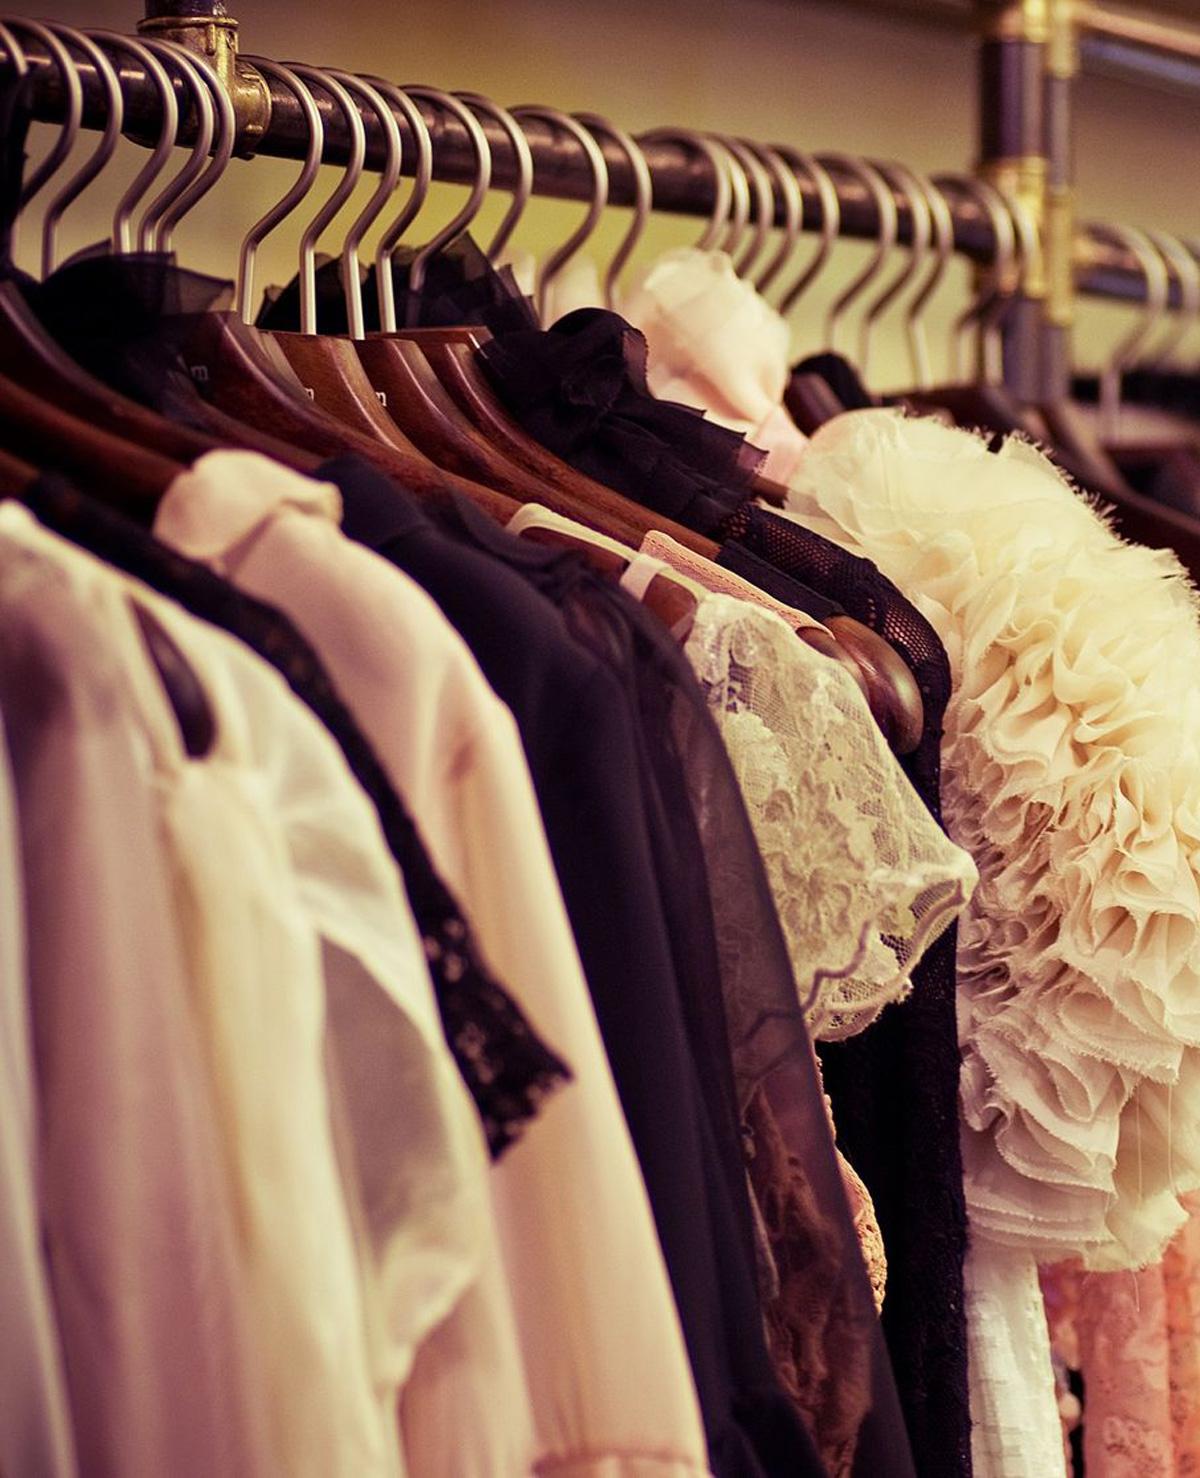 Kledingkast opgeruimd? Dit doe je met oude kleding!